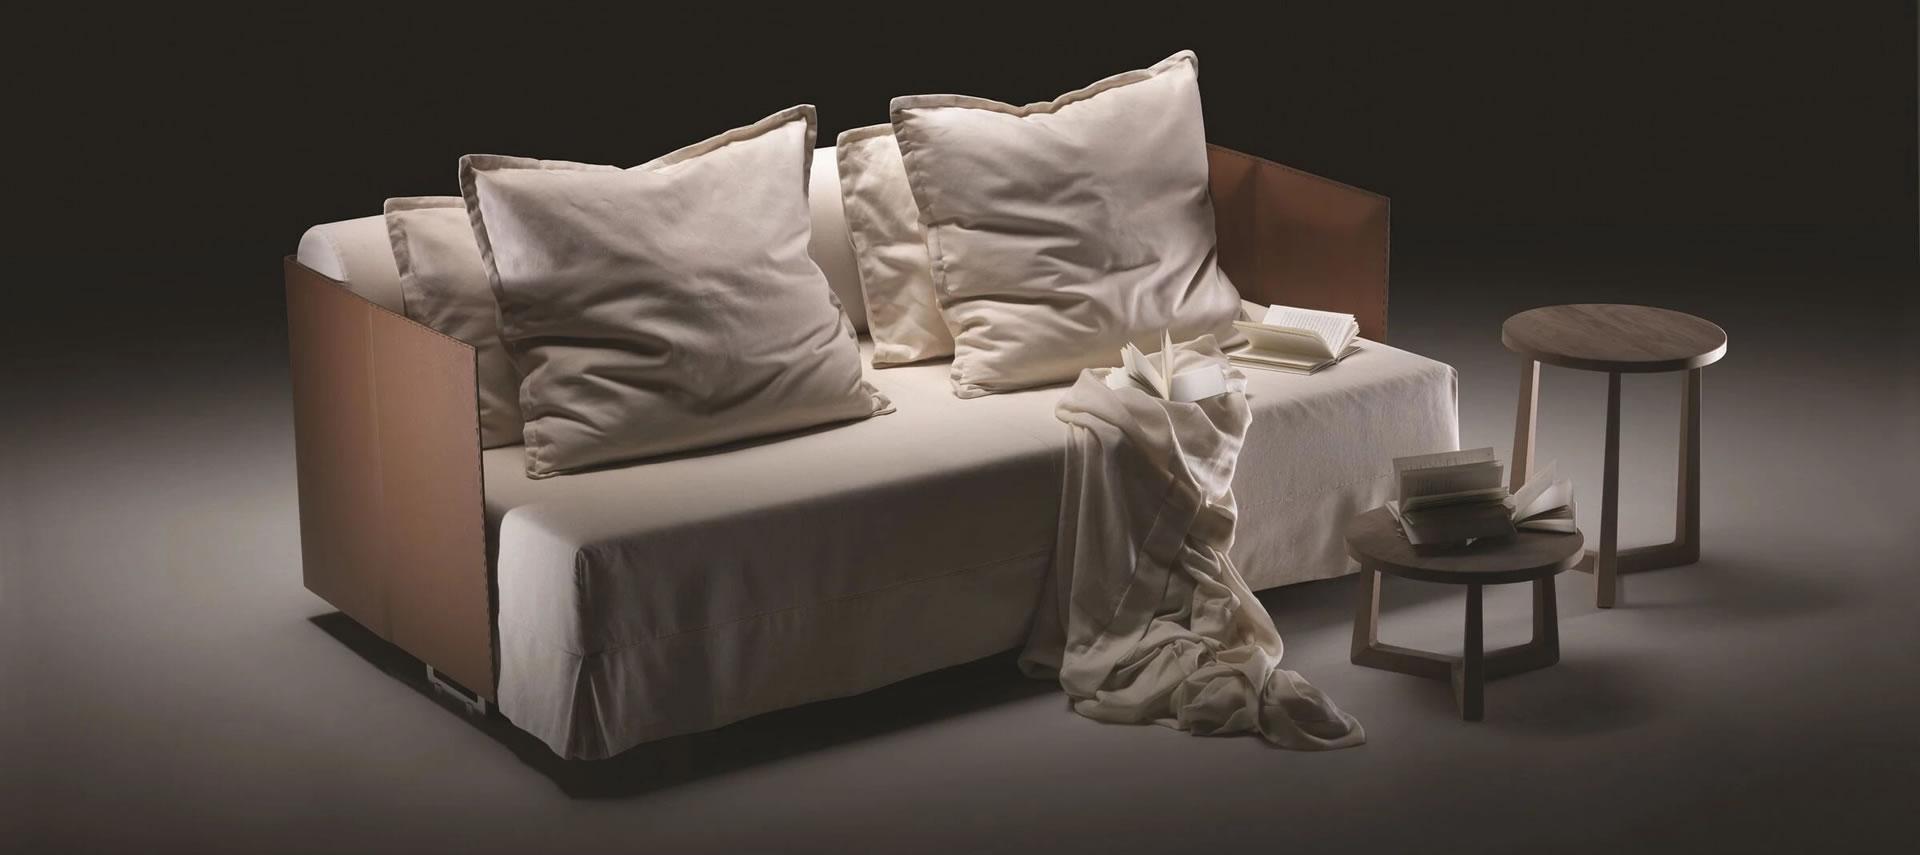 Eden flexform - Flexform divani letto ...